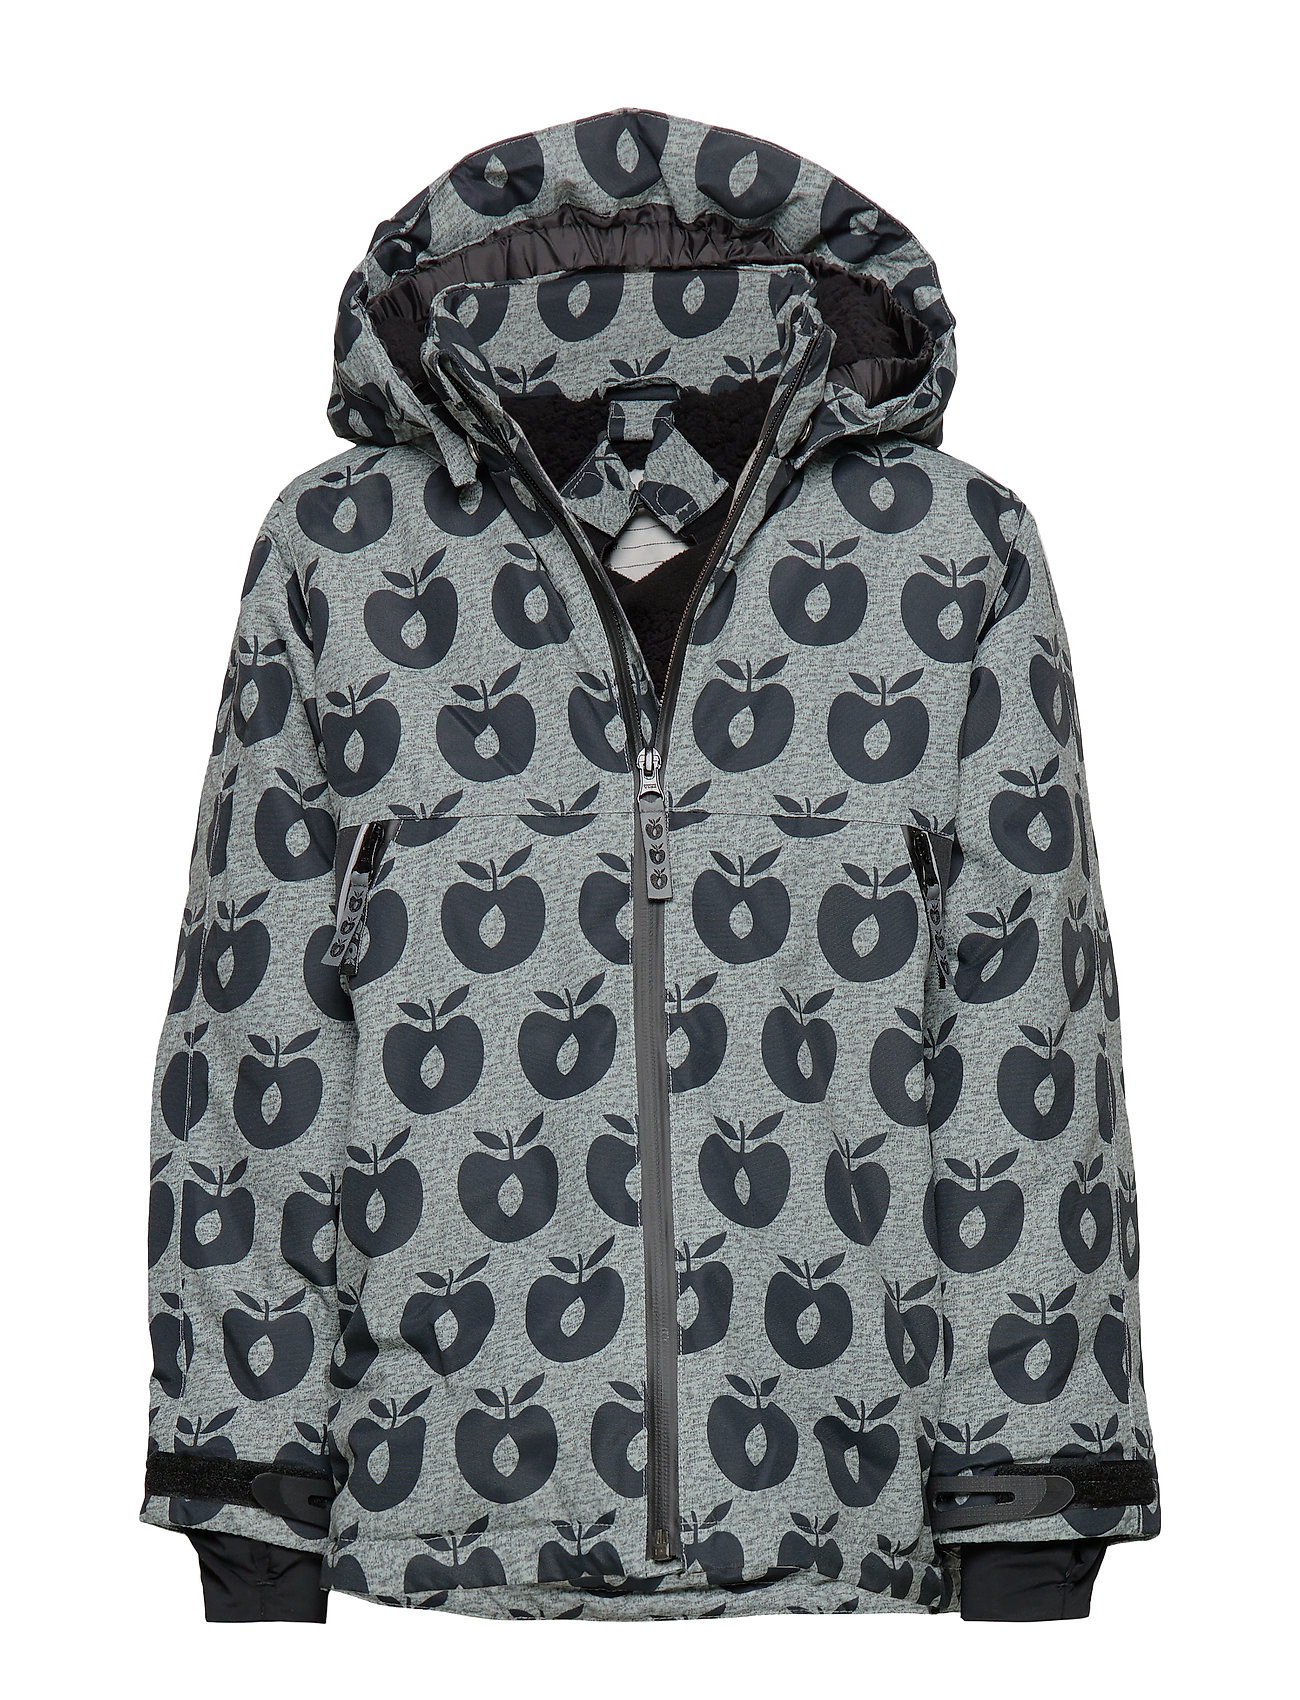 Småfolk Winter Jacket. Uni. Apple - B. GREY